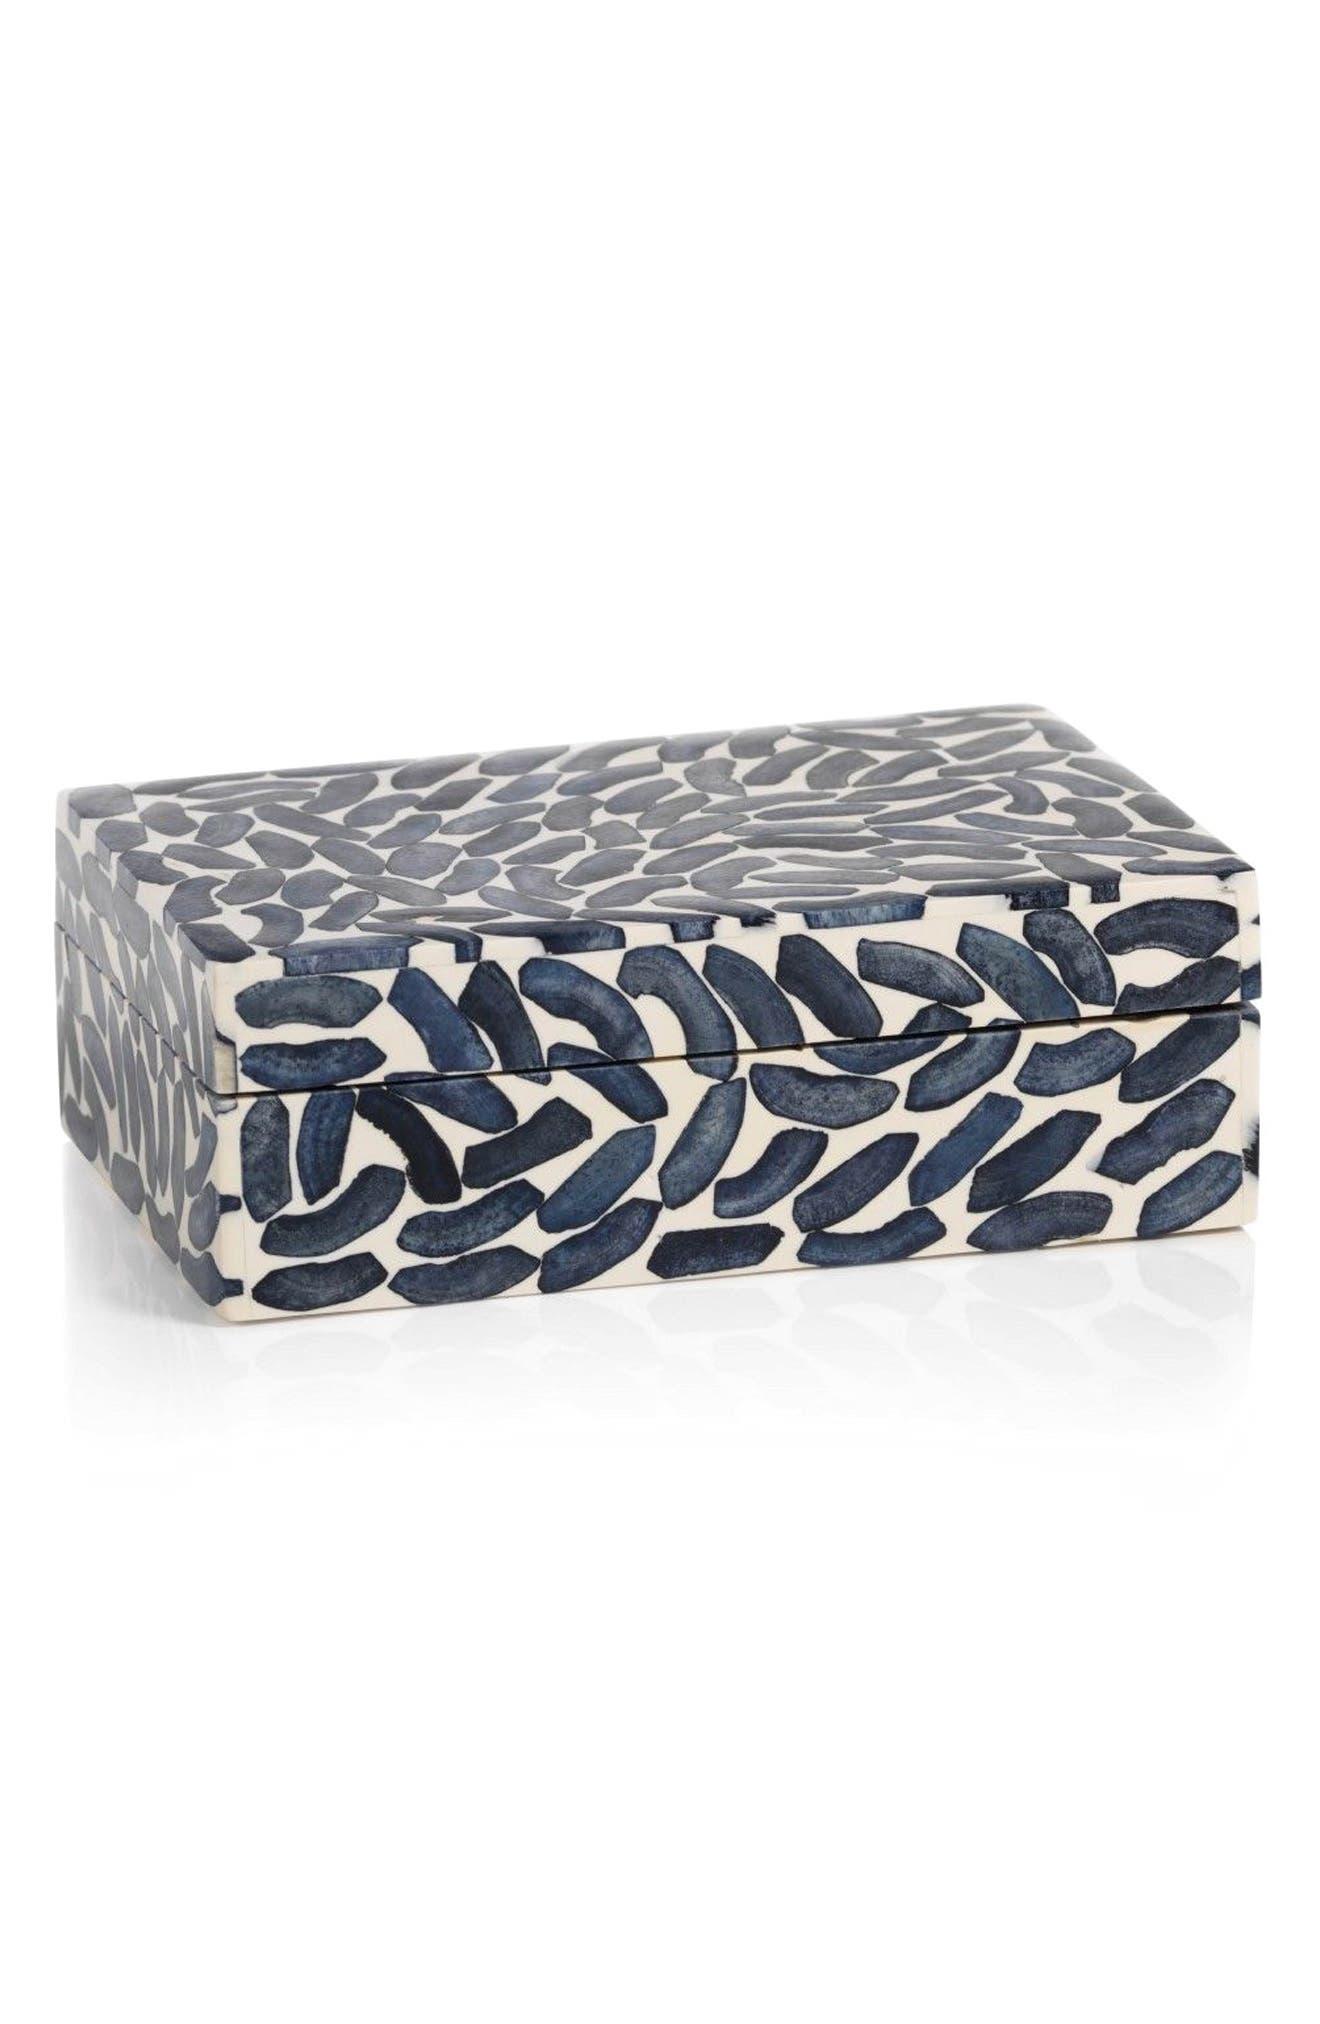 Legian Bone Jewelry Box,                             Main thumbnail 1, color,                             Blue/ Ivory